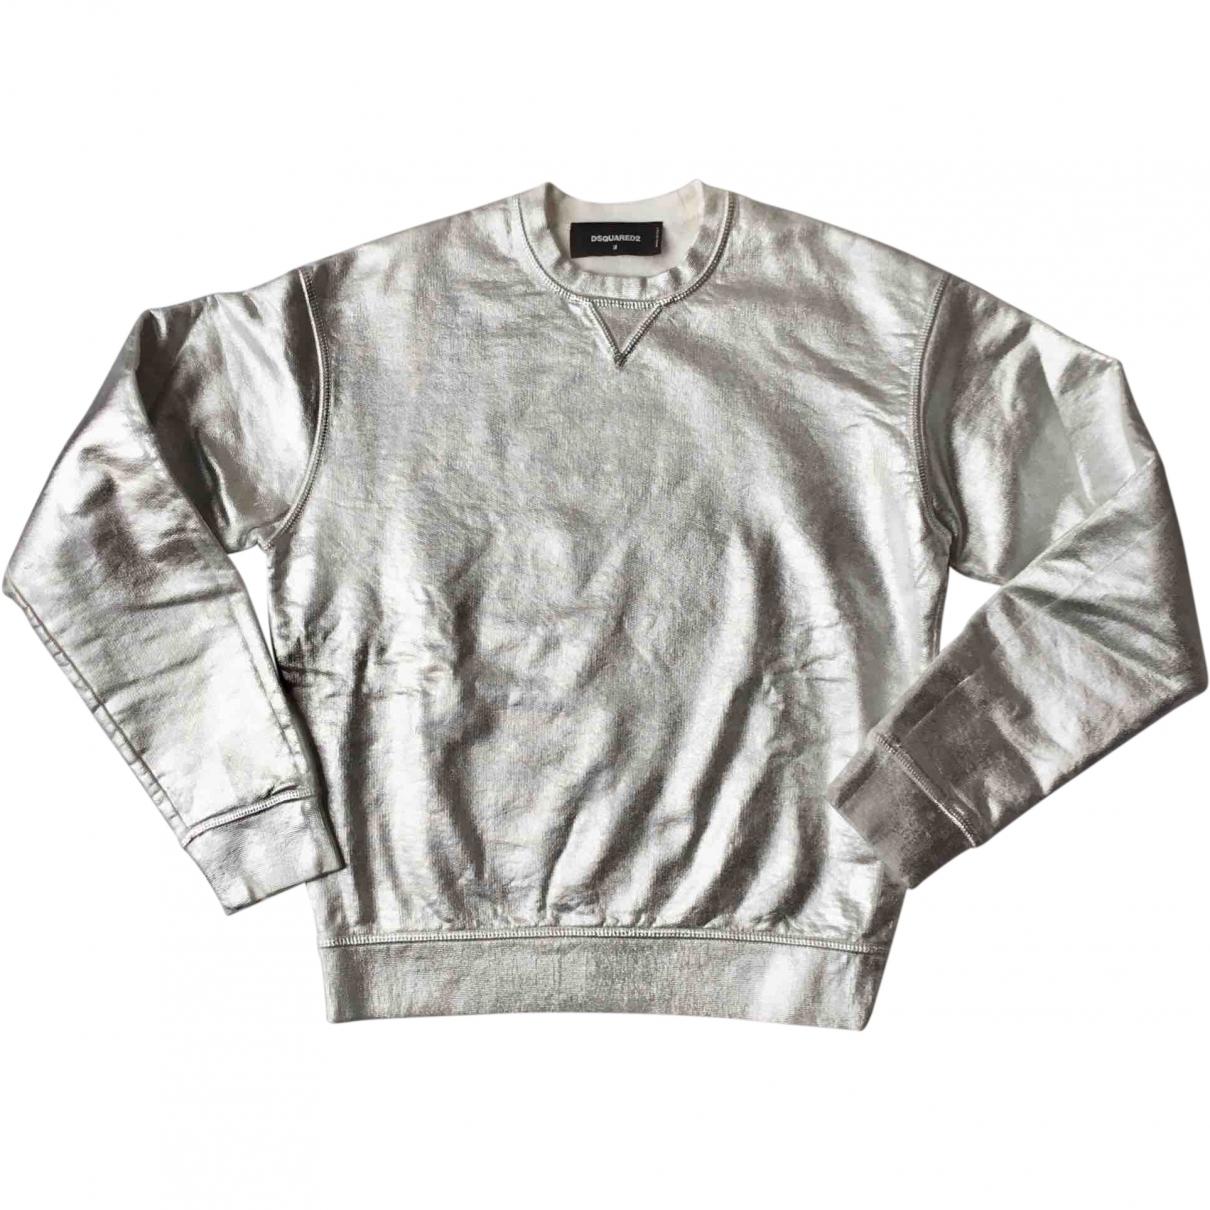 Dsquared2 \N Silver Cotton Knitwear for Women M International